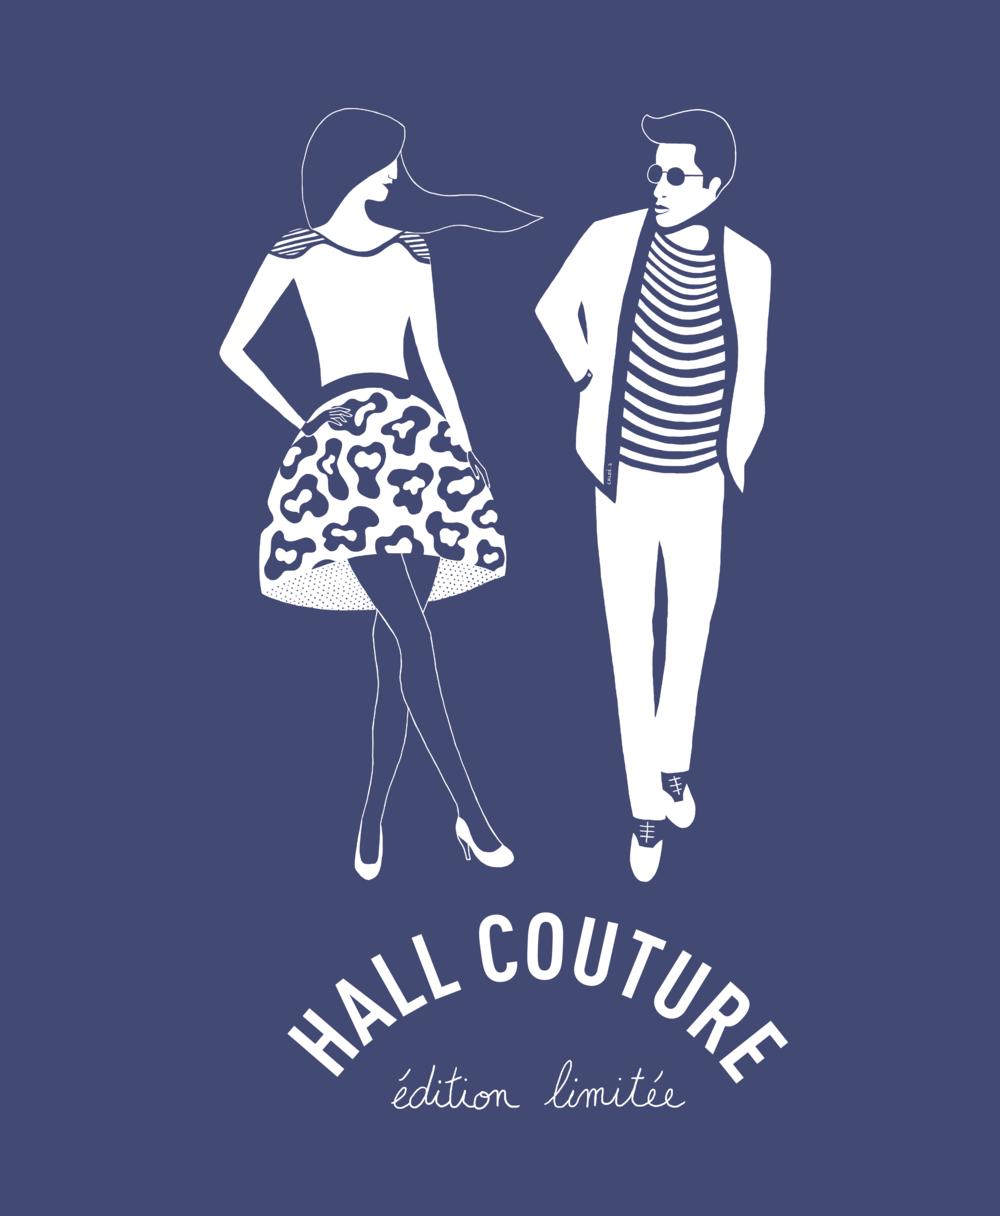 Illu-HallCouture.png